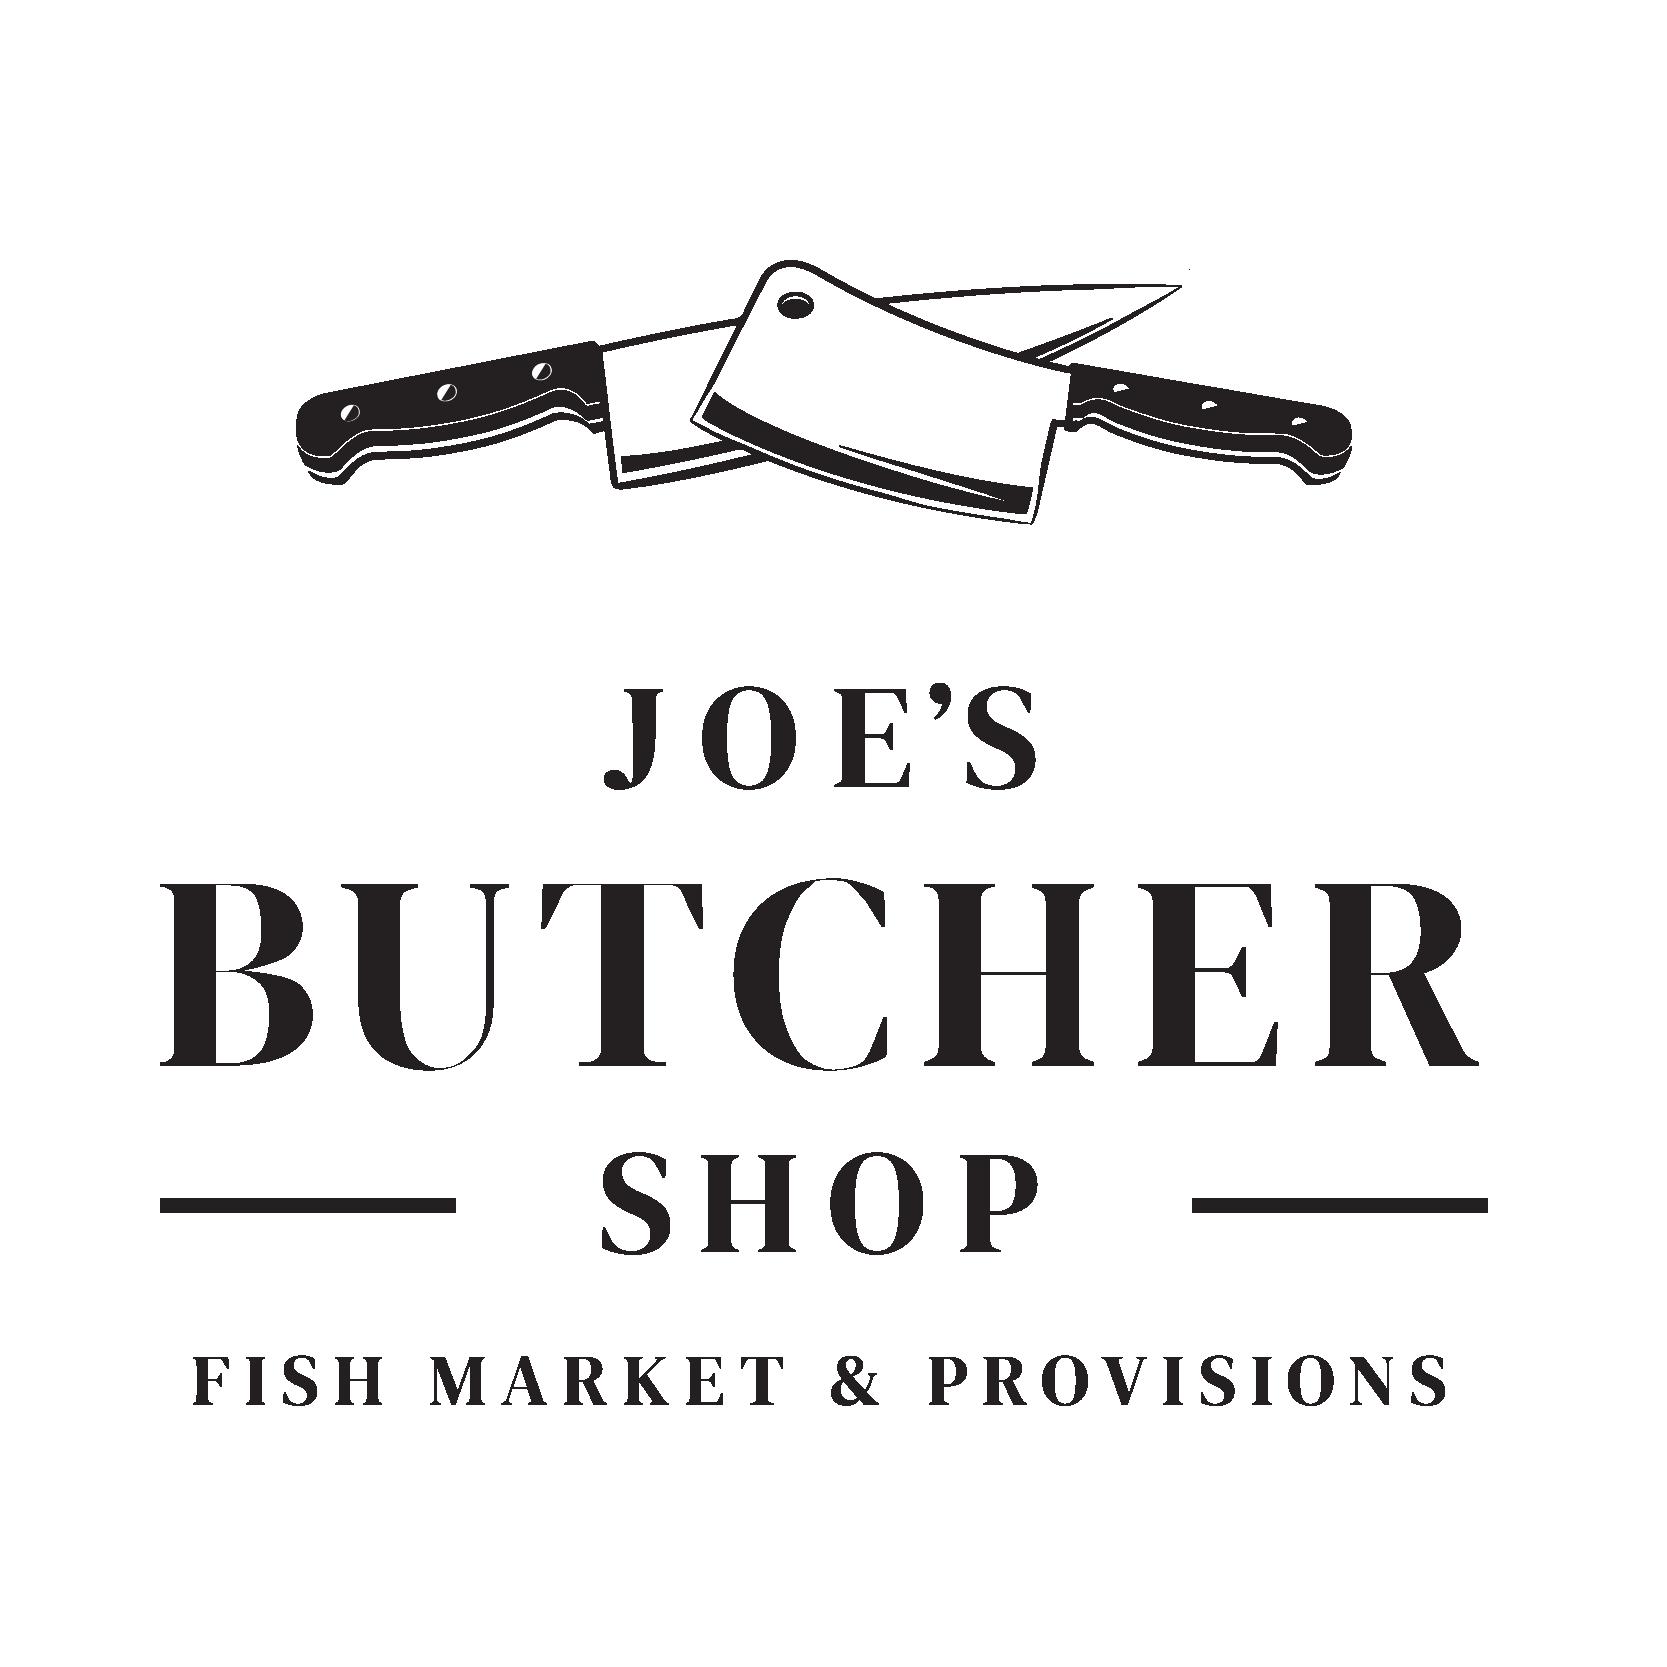 Joe's Butcher Shop